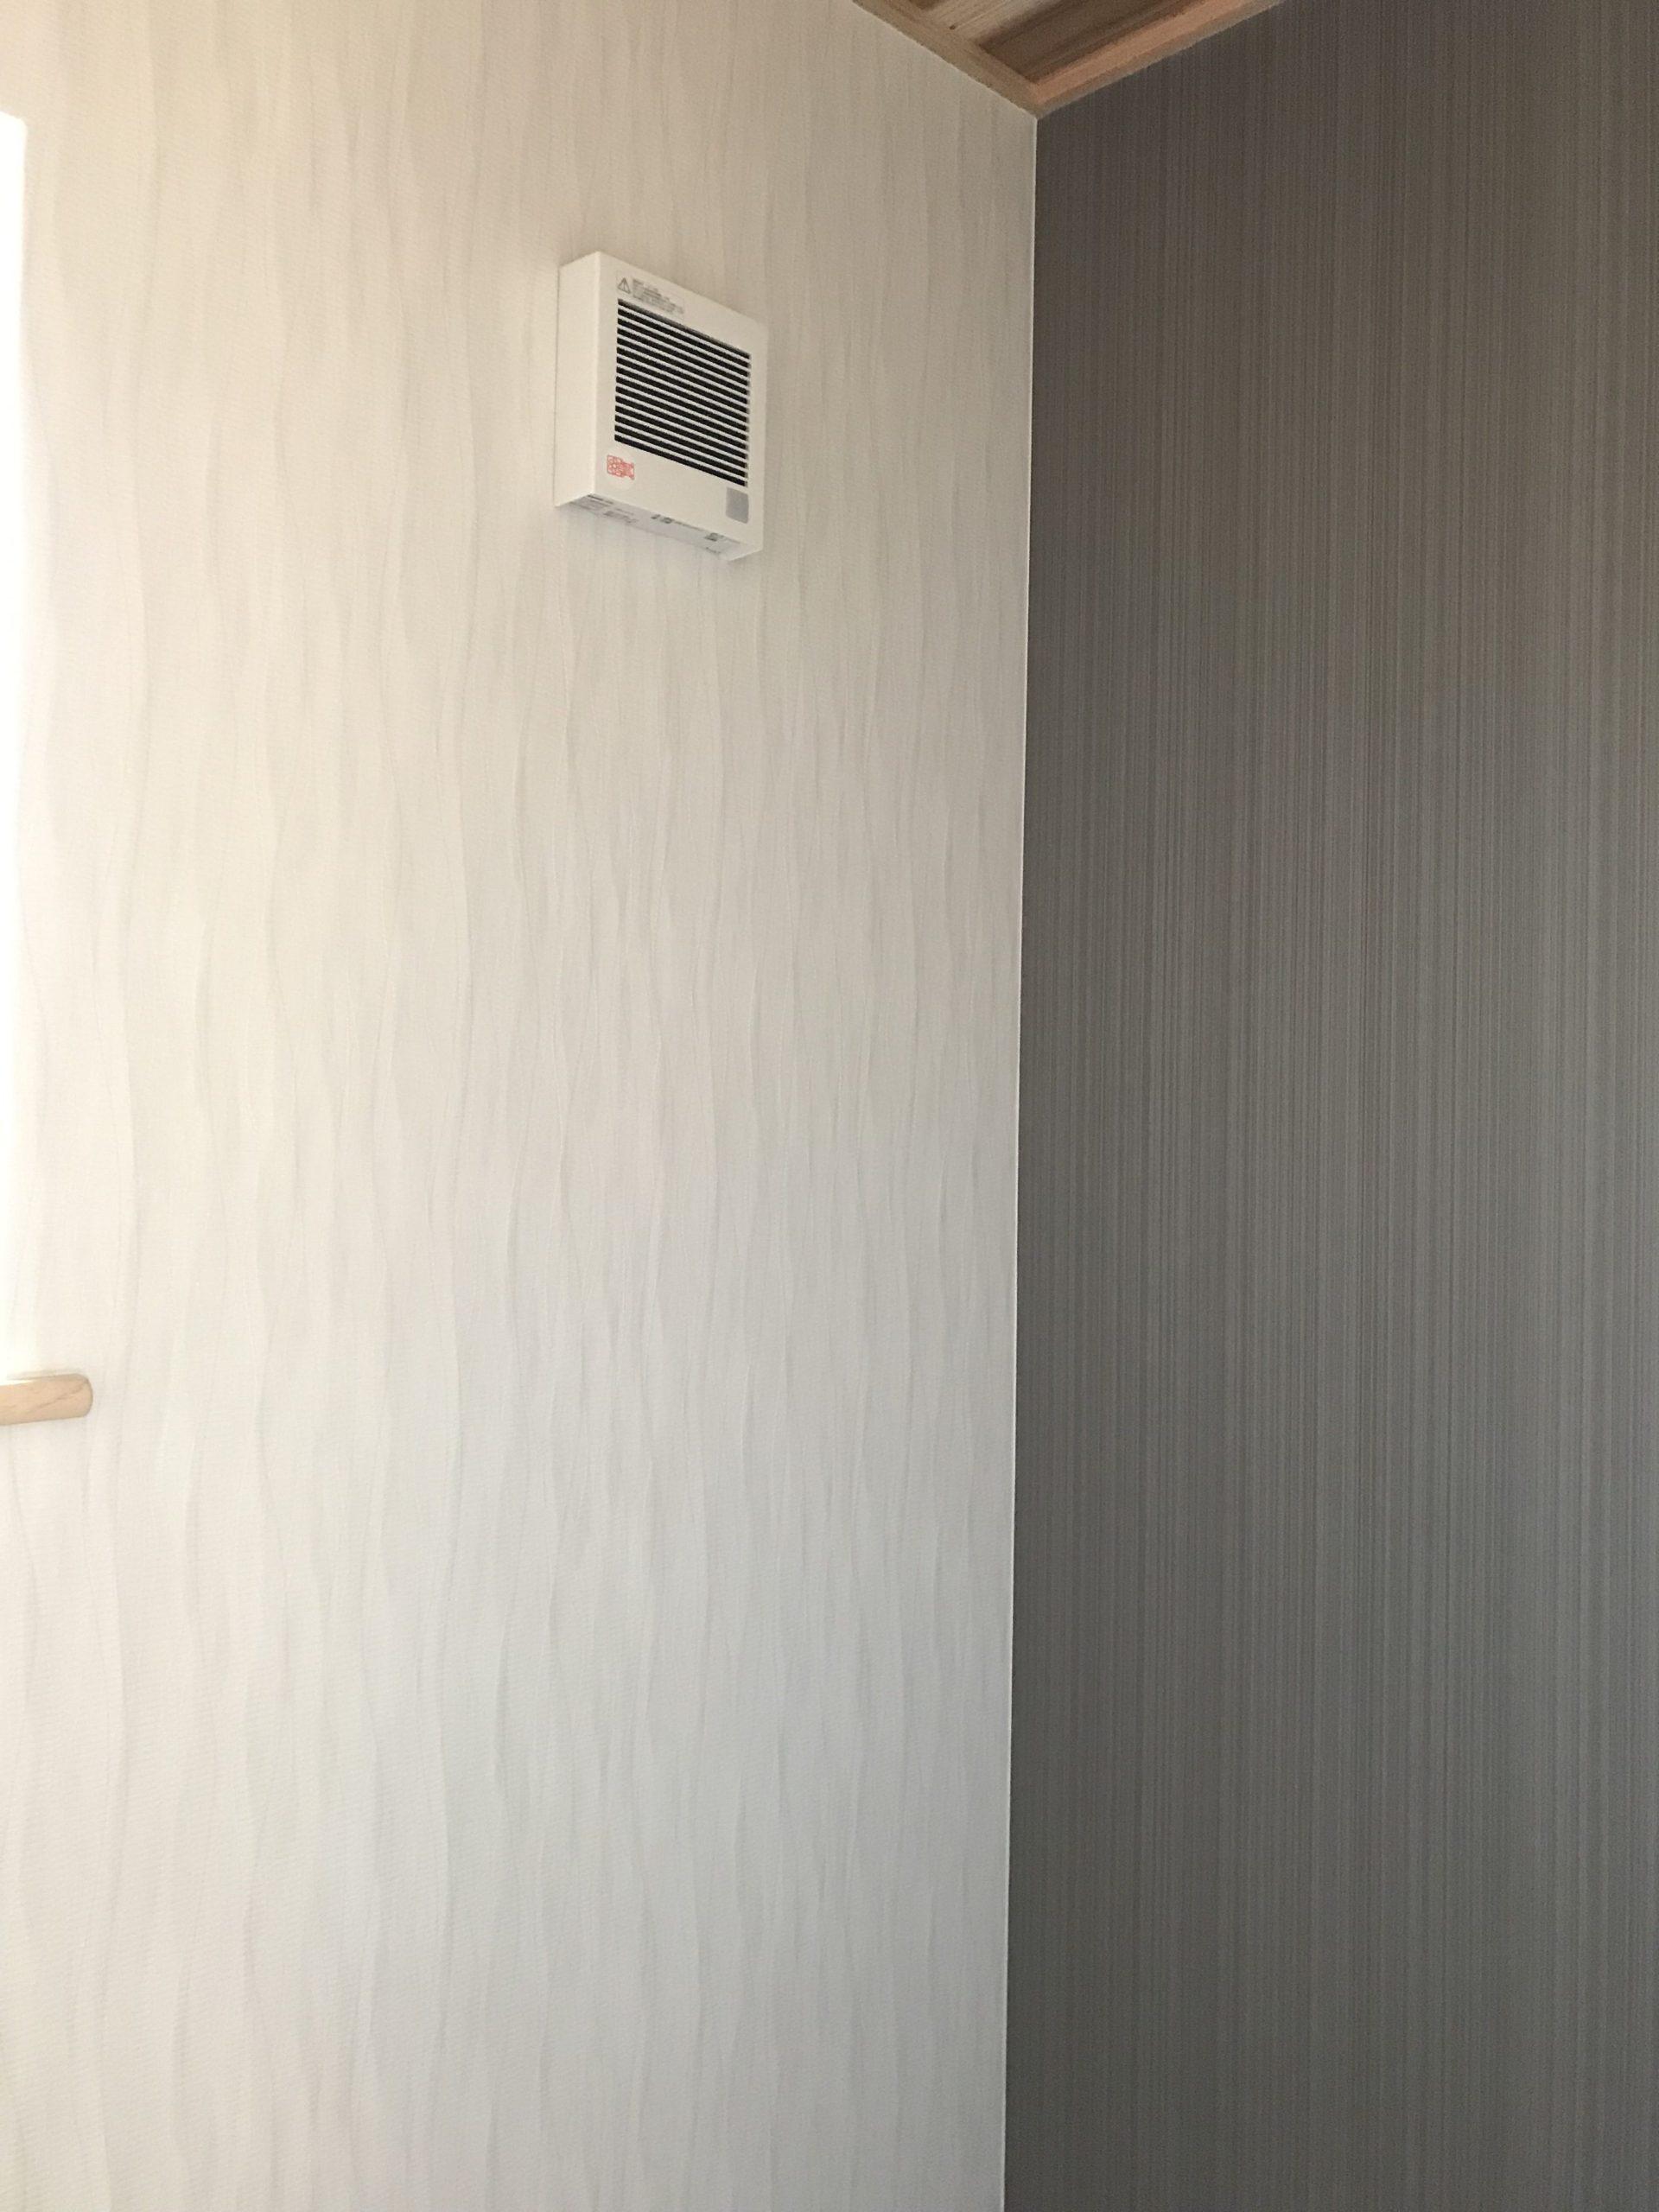 IMG_0617 - 坂井工務店 | 山口県山口市佐山 | 木造住宅、注文住宅の工務店